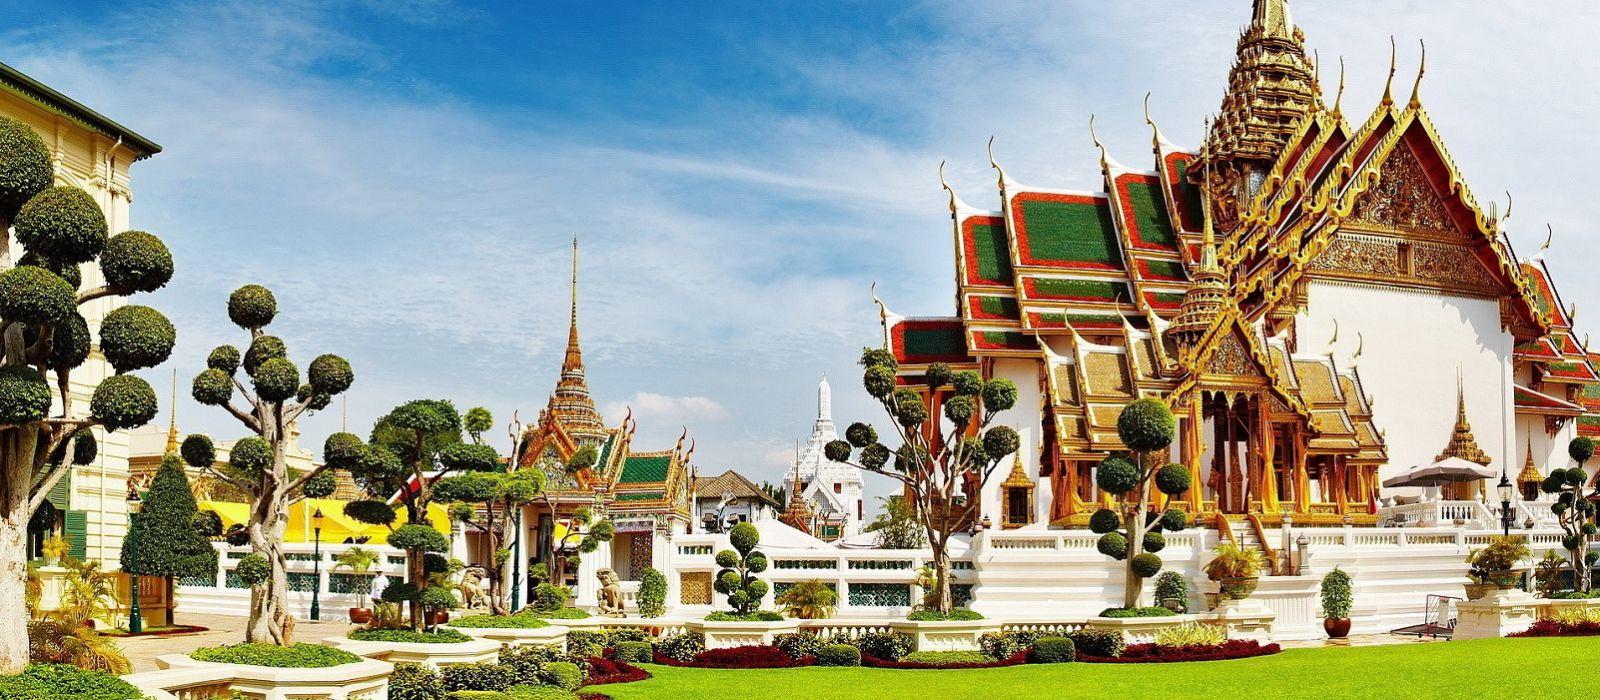 Luxury Bhutan and Thailand Paradise Islands Tour Trip 3